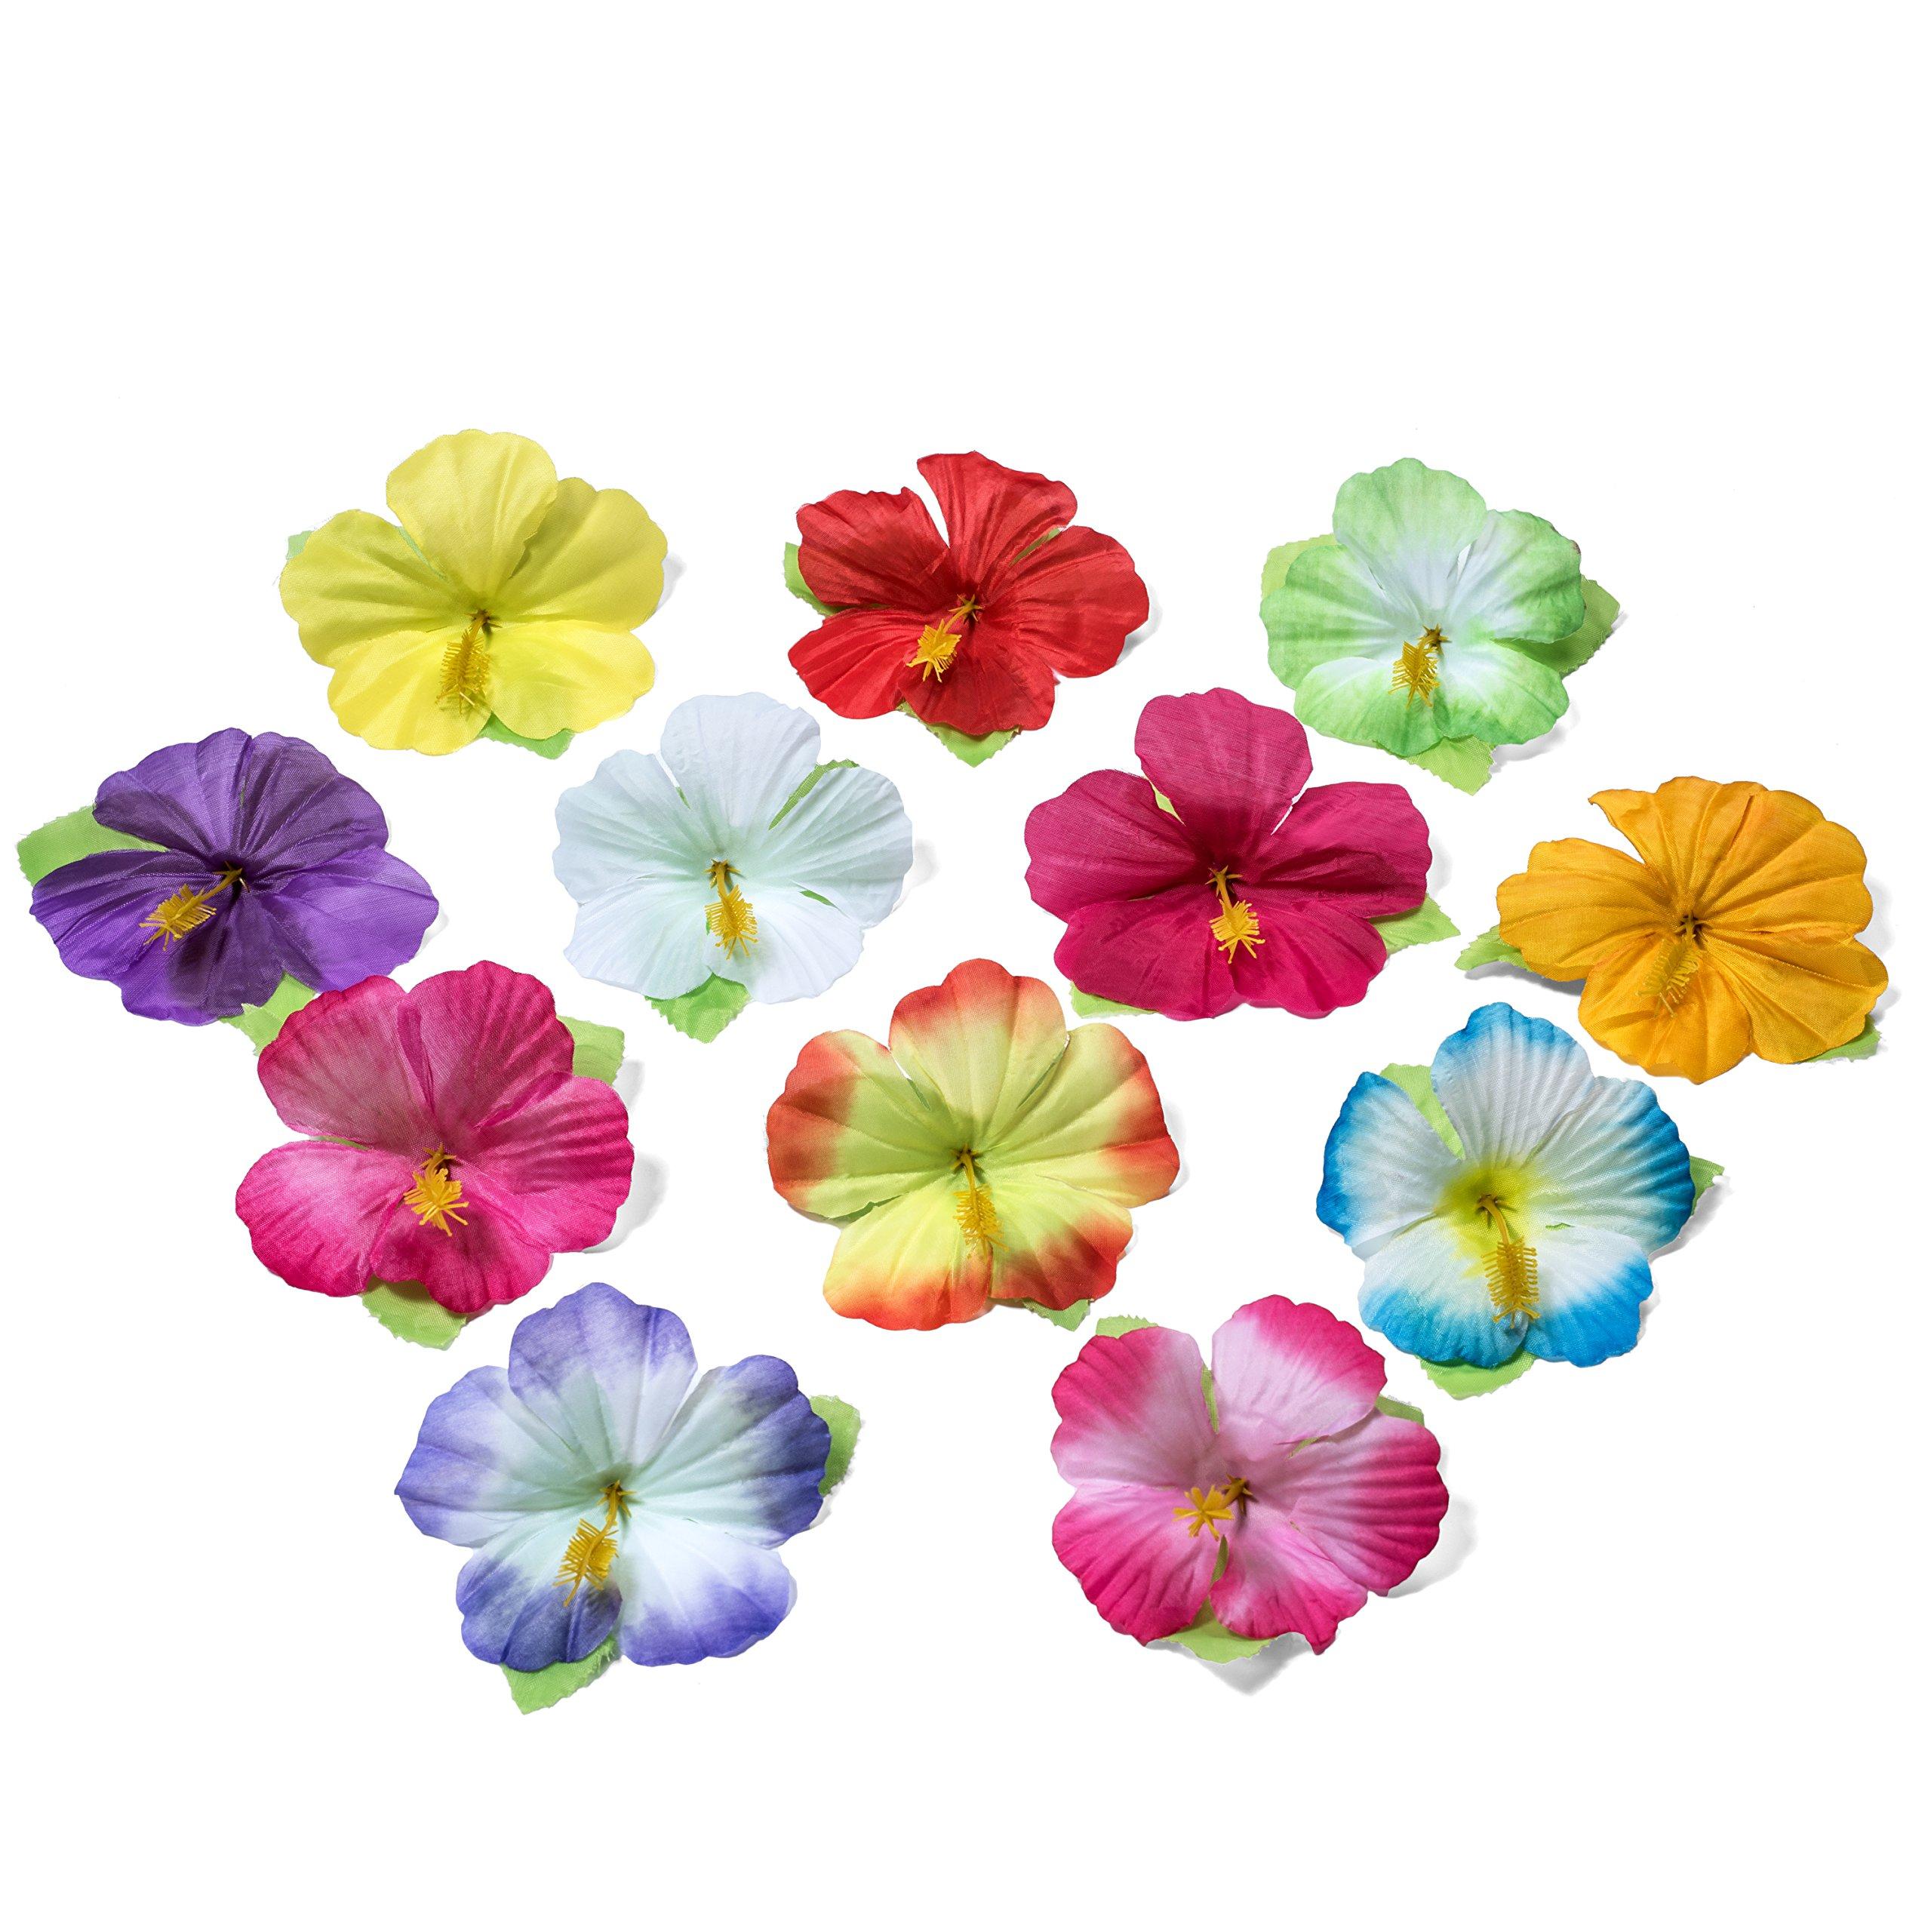 Hawaiian Luau Grass Table Skirt: BONUS 12 Hibiscus Flowers | Includes Adhesive | Perfect Beach, Tiki, Tropical, Island, Party, Luau Decoration 9ft by Luau Essentials (Image #2)